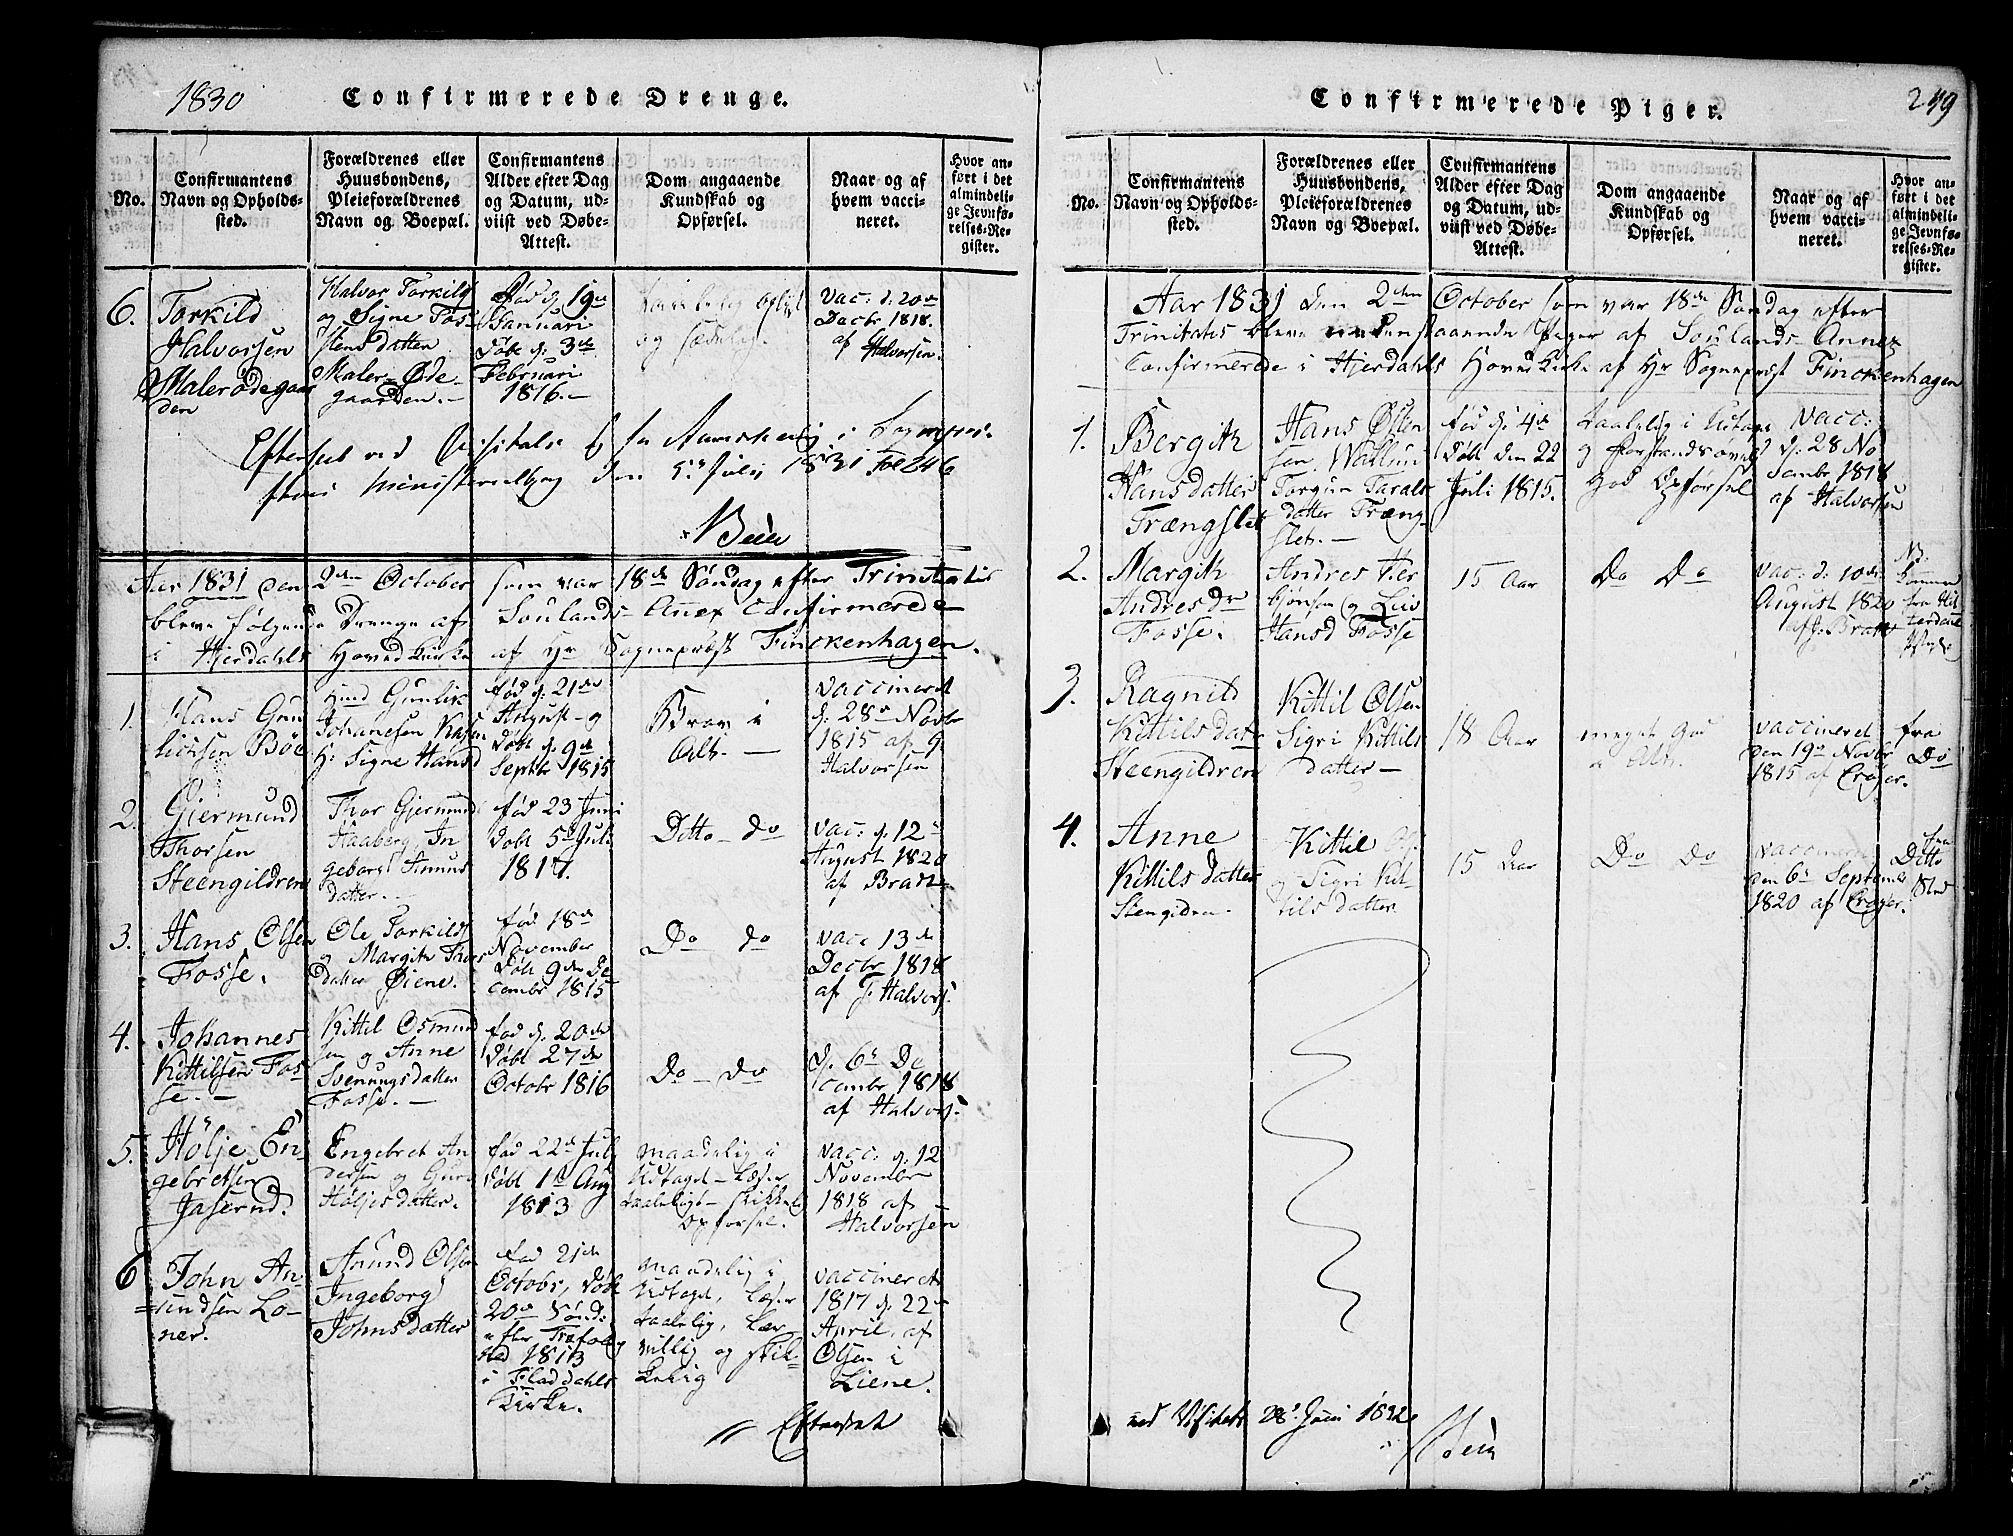 SAKO, Hjartdal kirkebøker, G/Gb/L0001: Klokkerbok nr. II 1, 1815-1842, s. 249